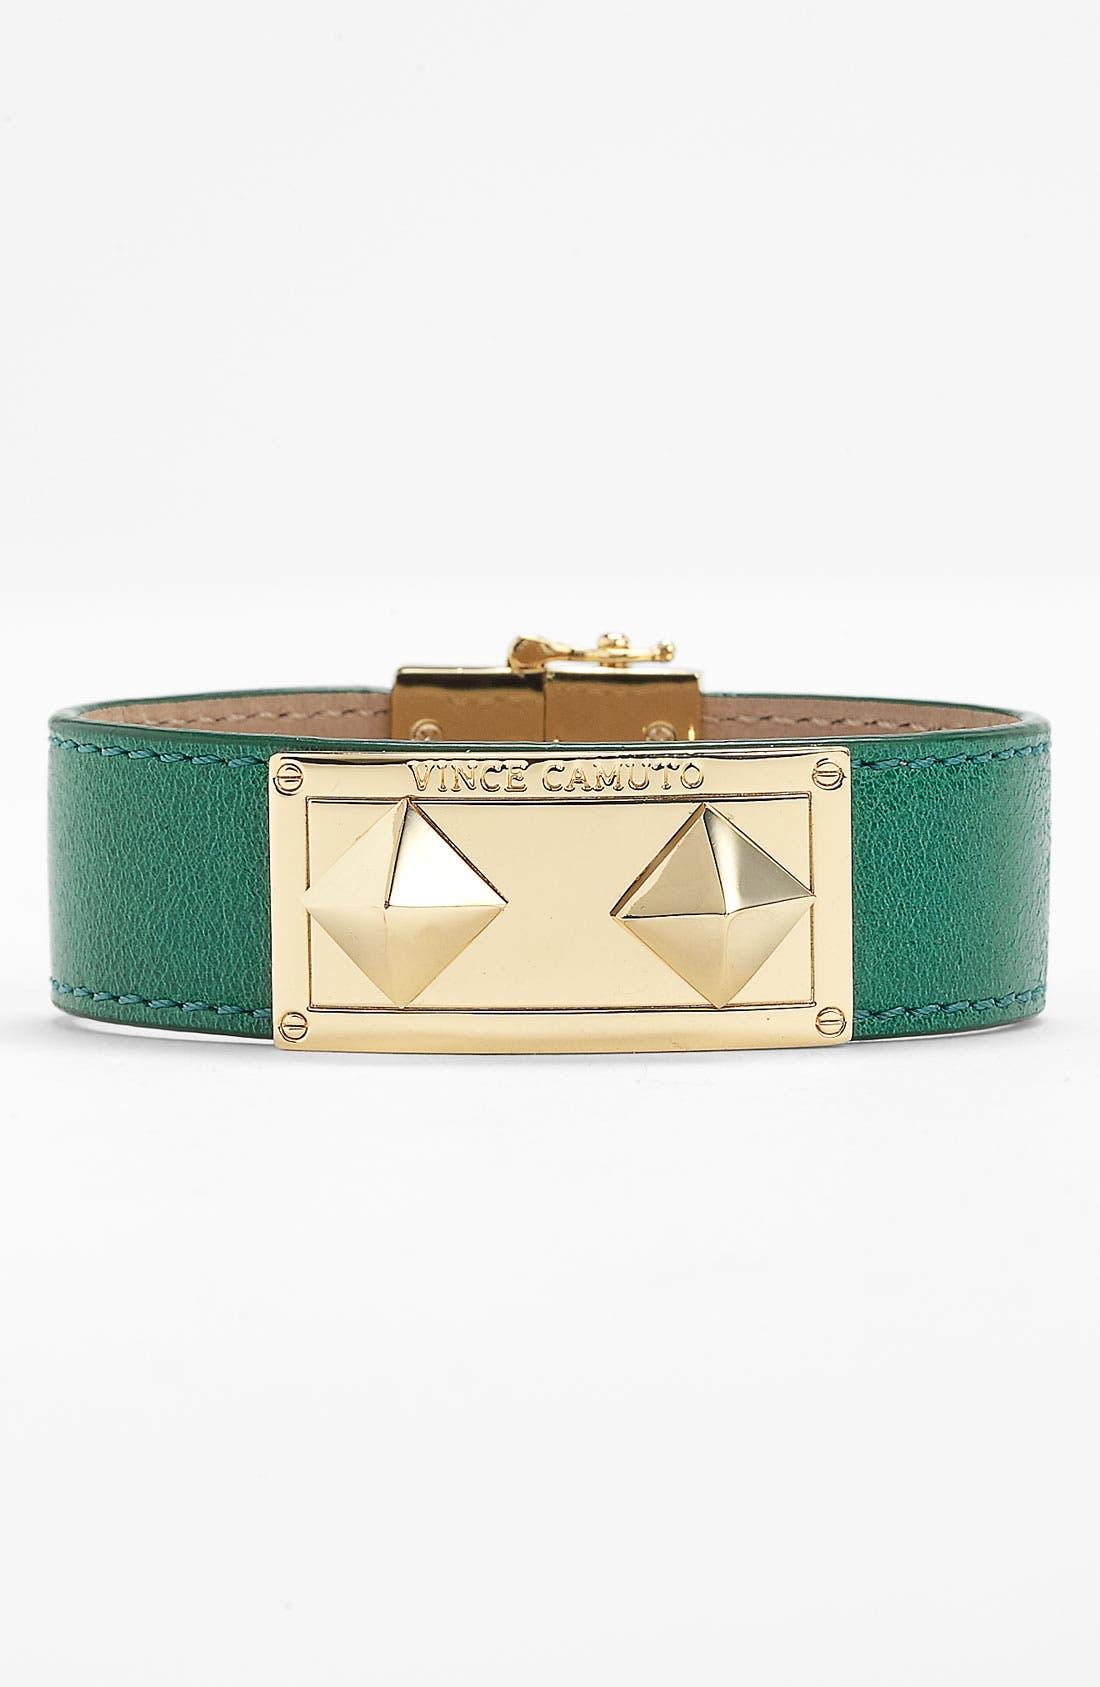 Alternate Image 1 Selected - Vince Camuto Studded Leather Wrap Bracelet